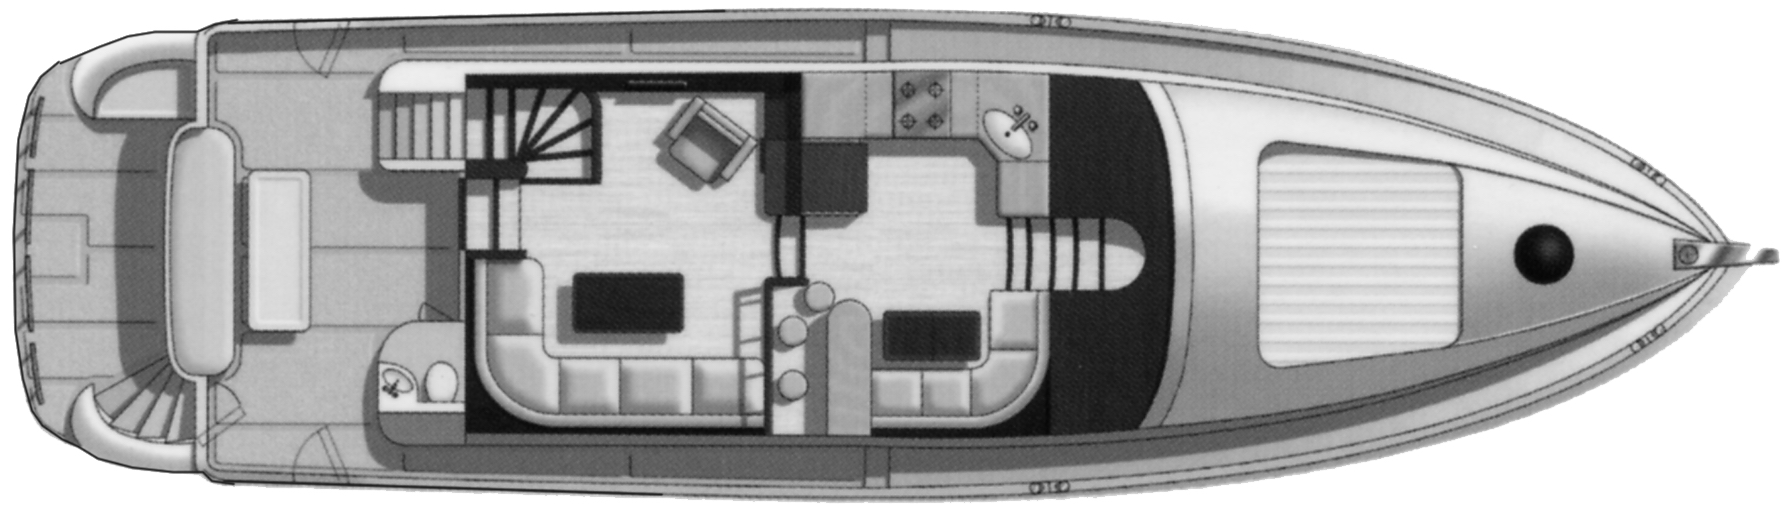 600 Motor Yacht; 660 Cockpit MY Floor Plan 2